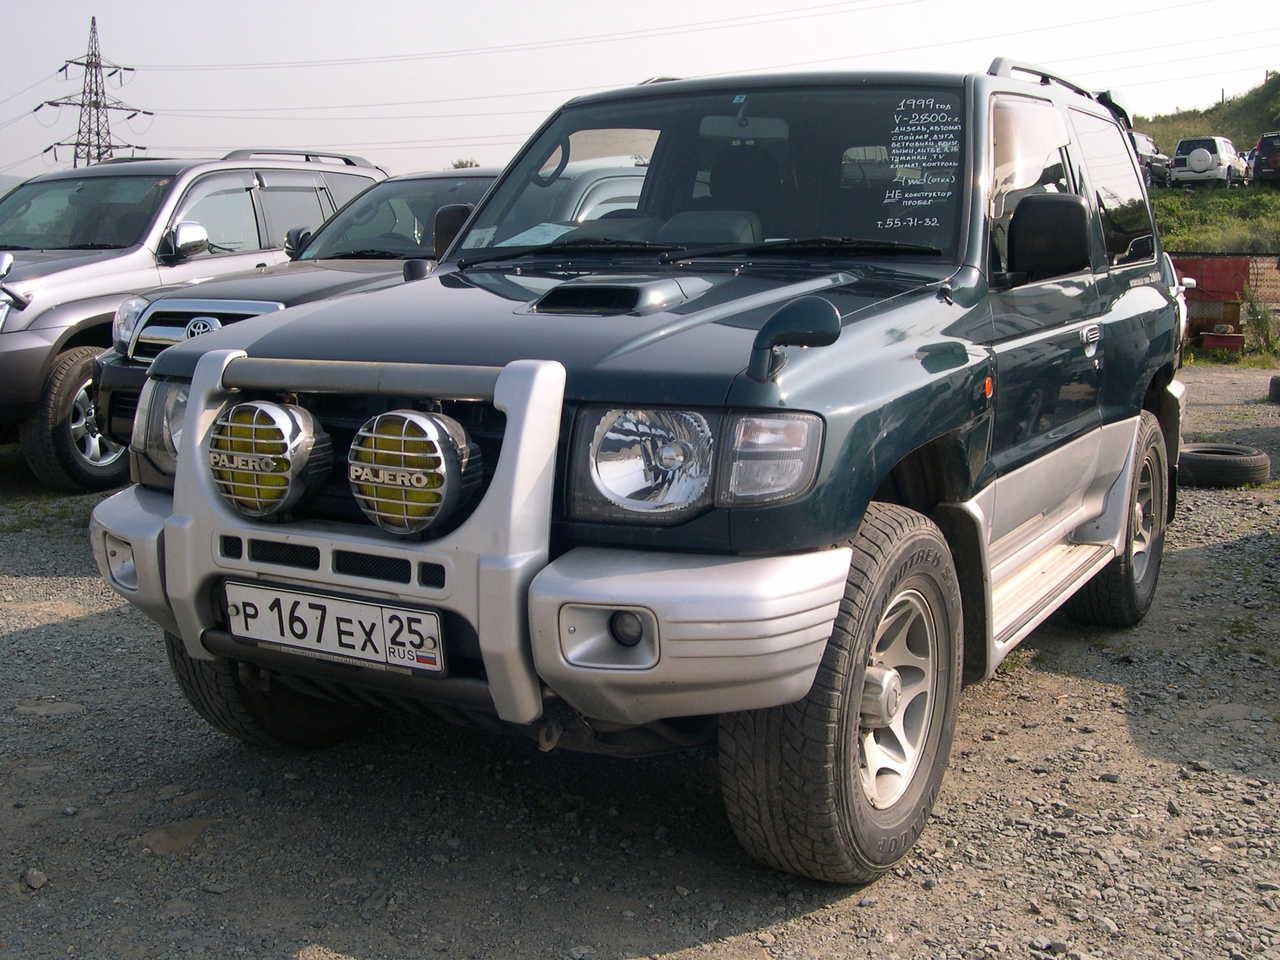 1999 Mitsubishi Pajero Photos 2 8 Diesel Automatic For Sale